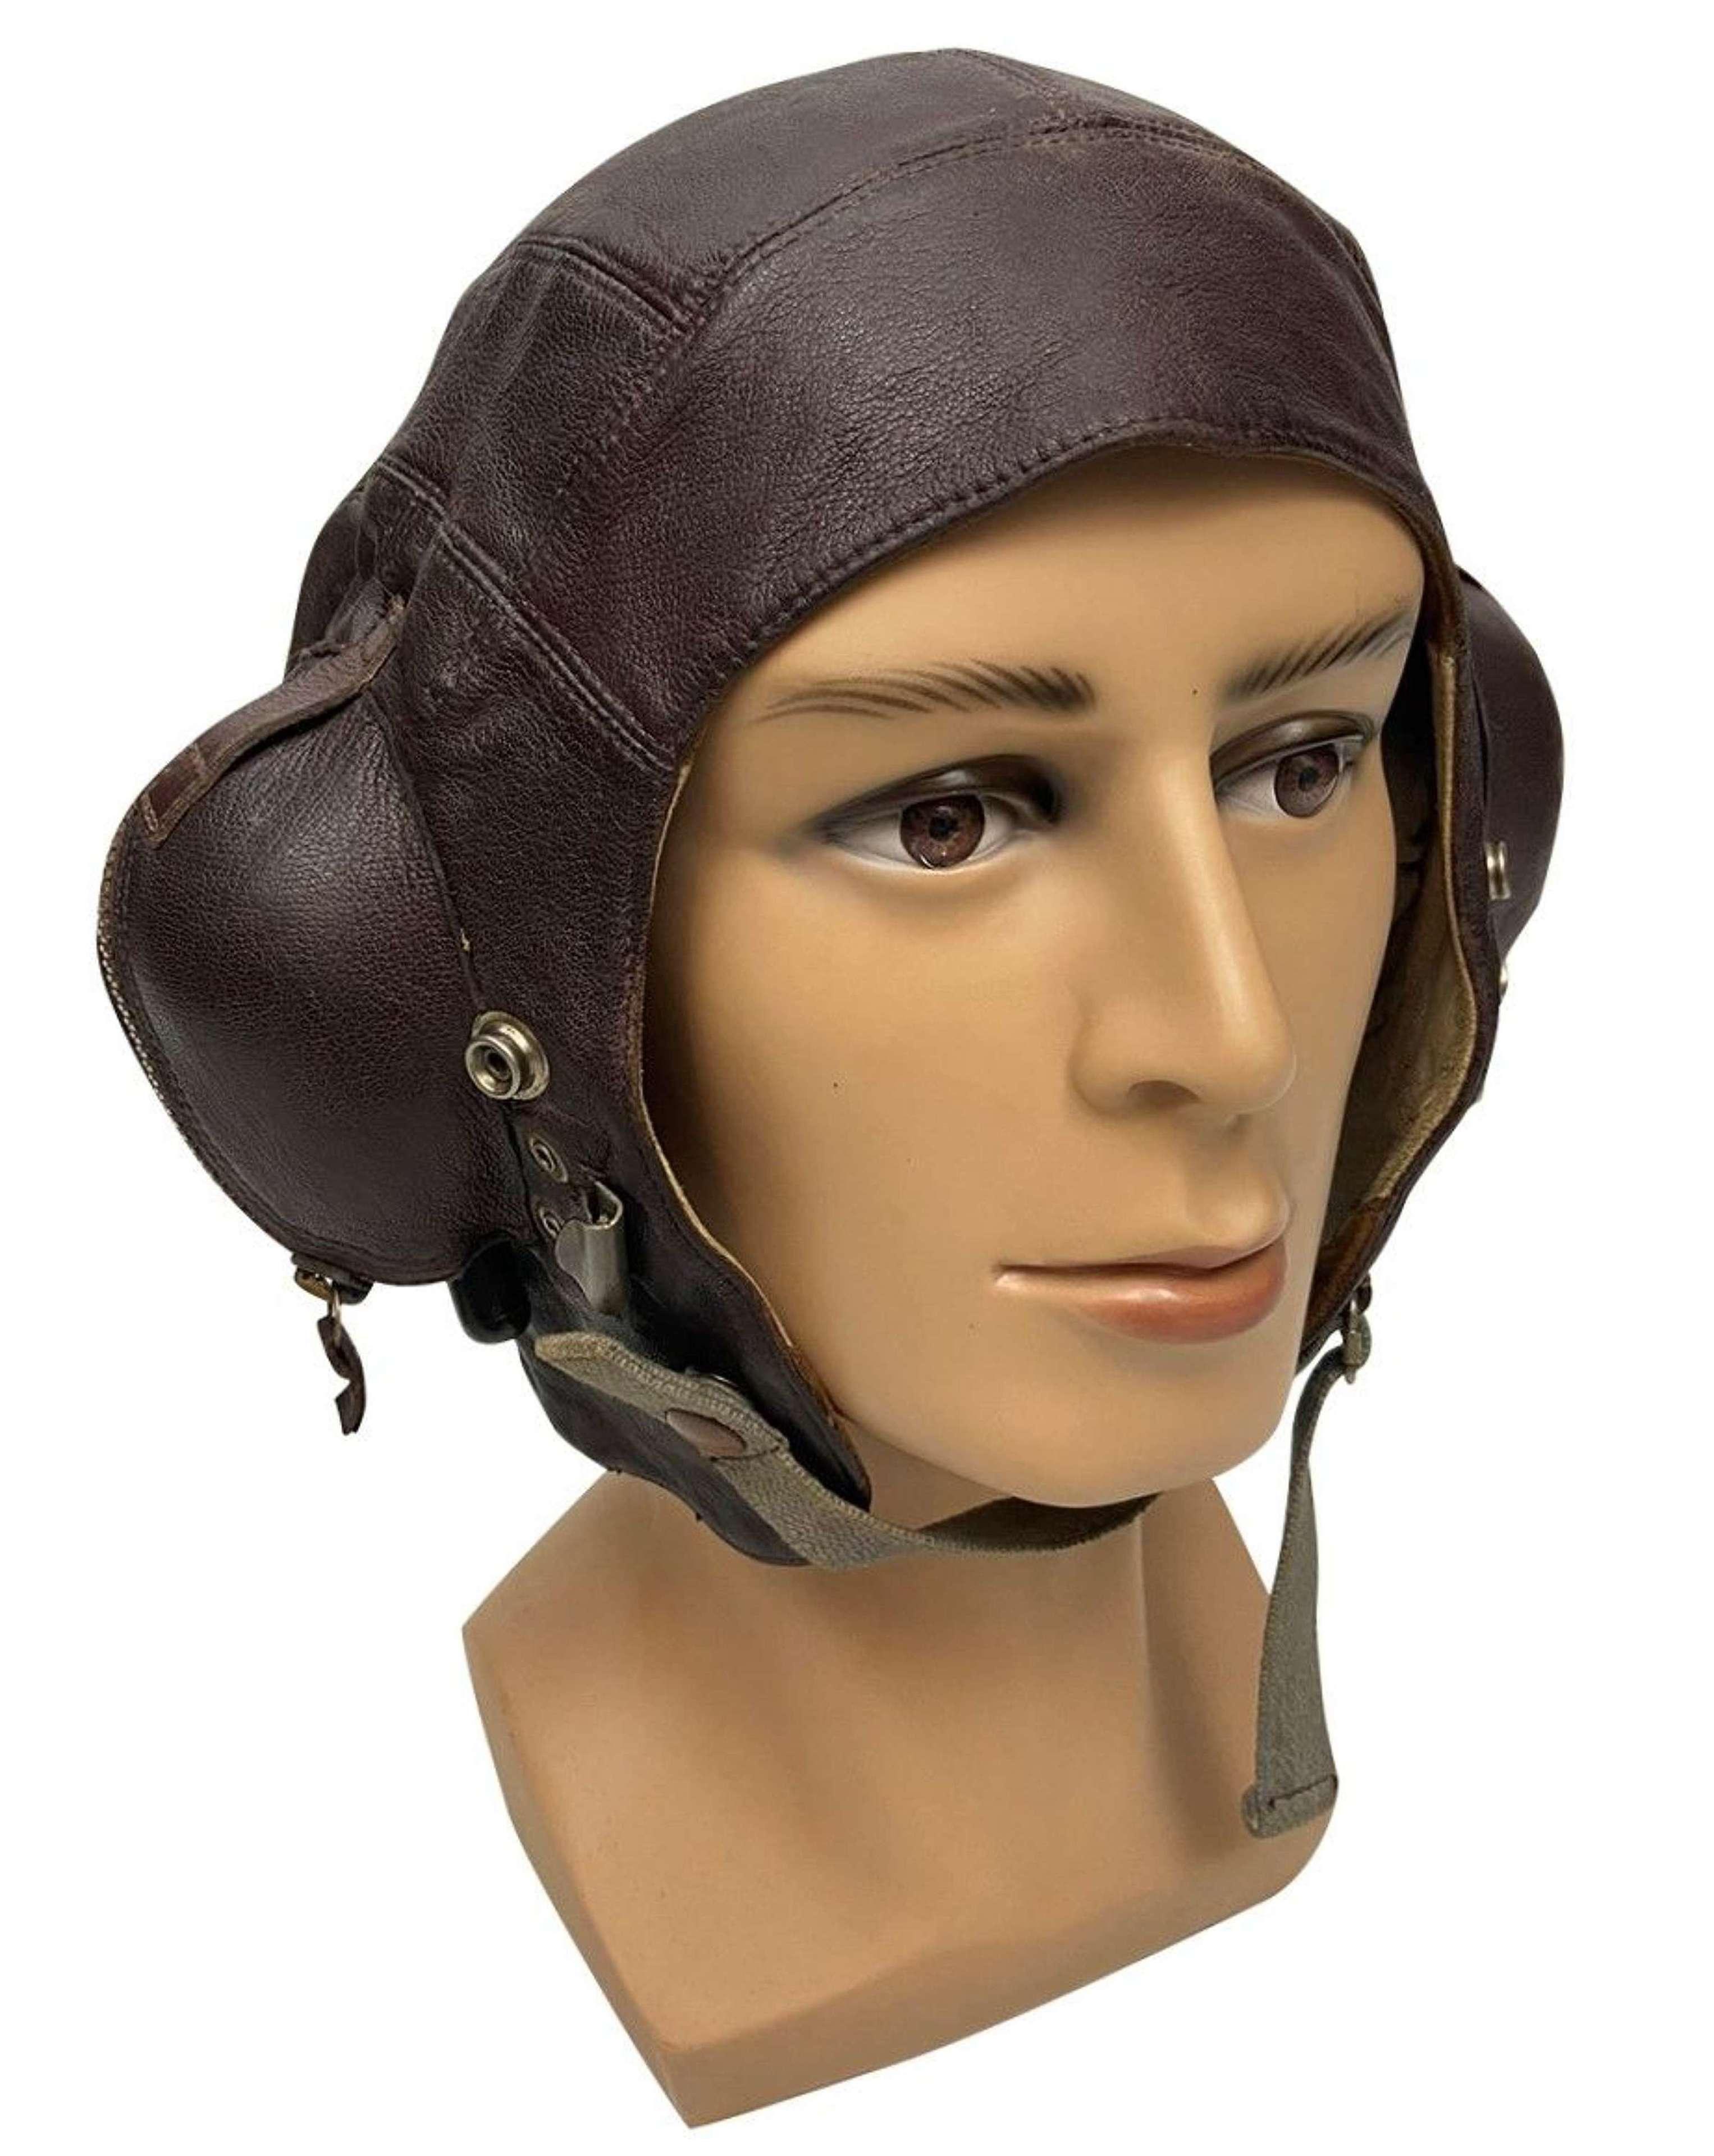 Original WW2 Royal Navy Fleet Air Arm C Type Flying Helmet